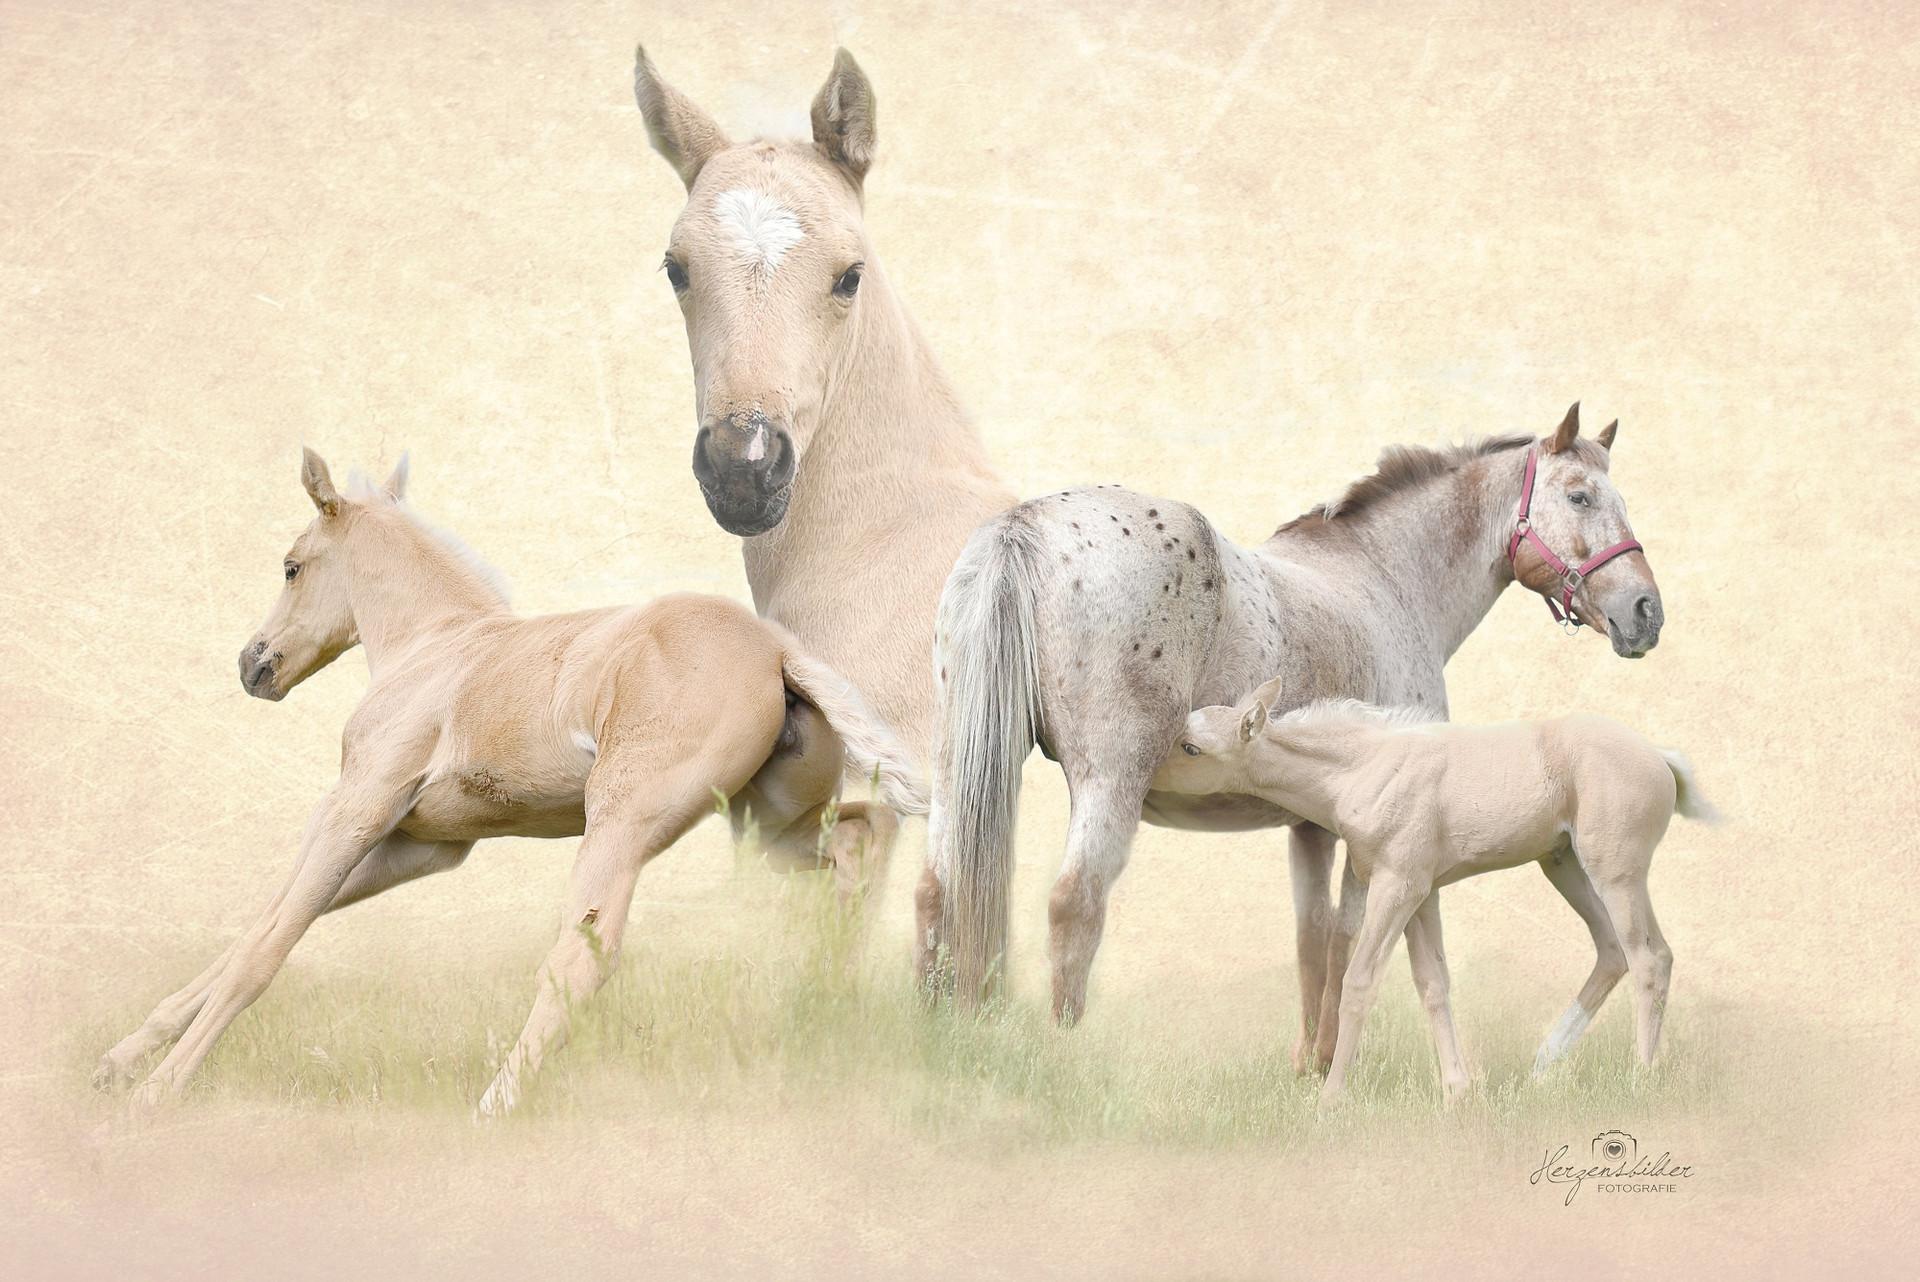 Pferde Wildpferde Hengst Schnee reiten Halle Fotos Pferd SeaHorse Ranch Palomino Apaloosa